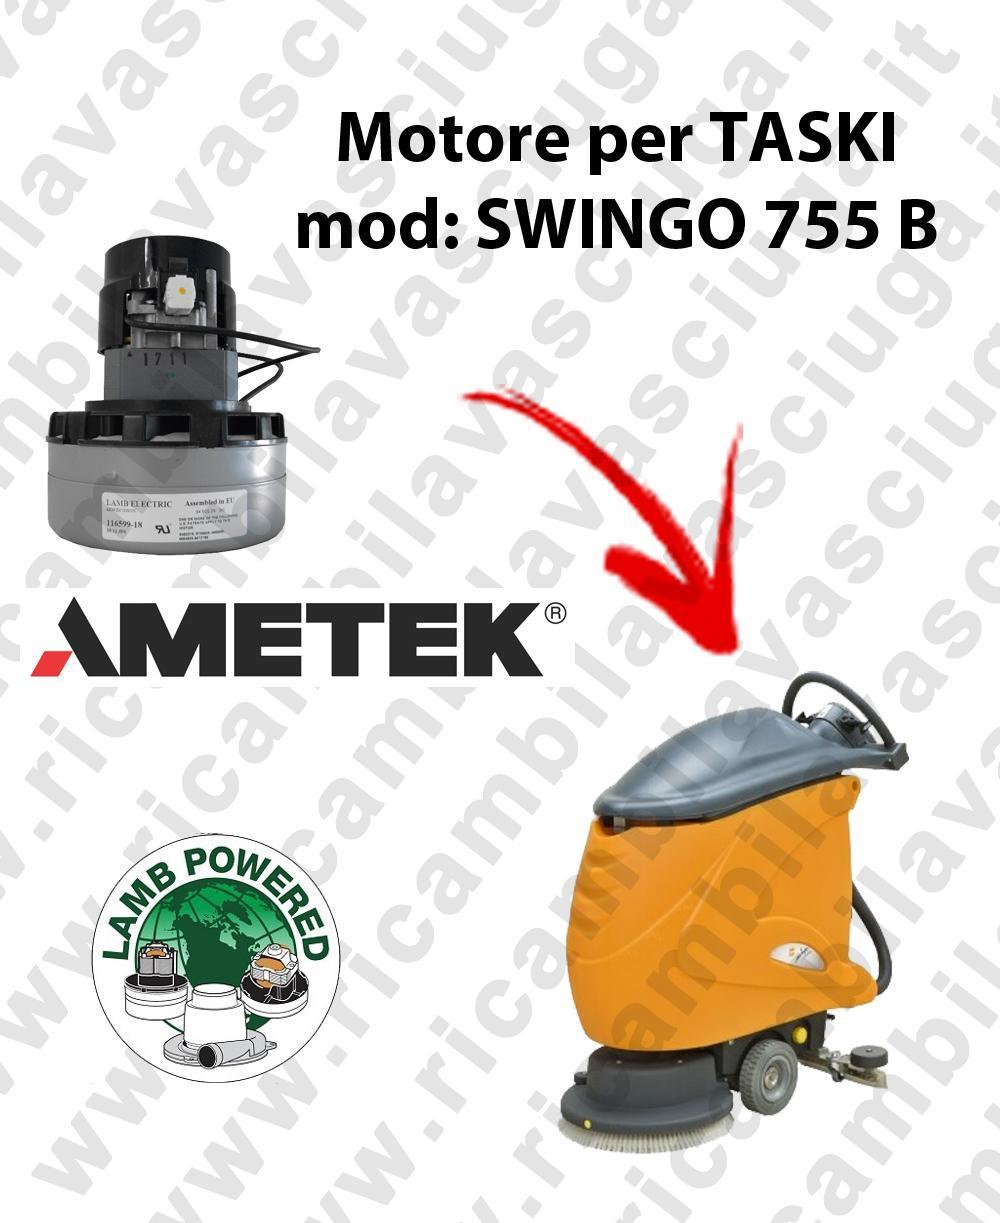 SWINGO 755 B Motore de aspiración LAMB AMETEK para fregadora TASKI